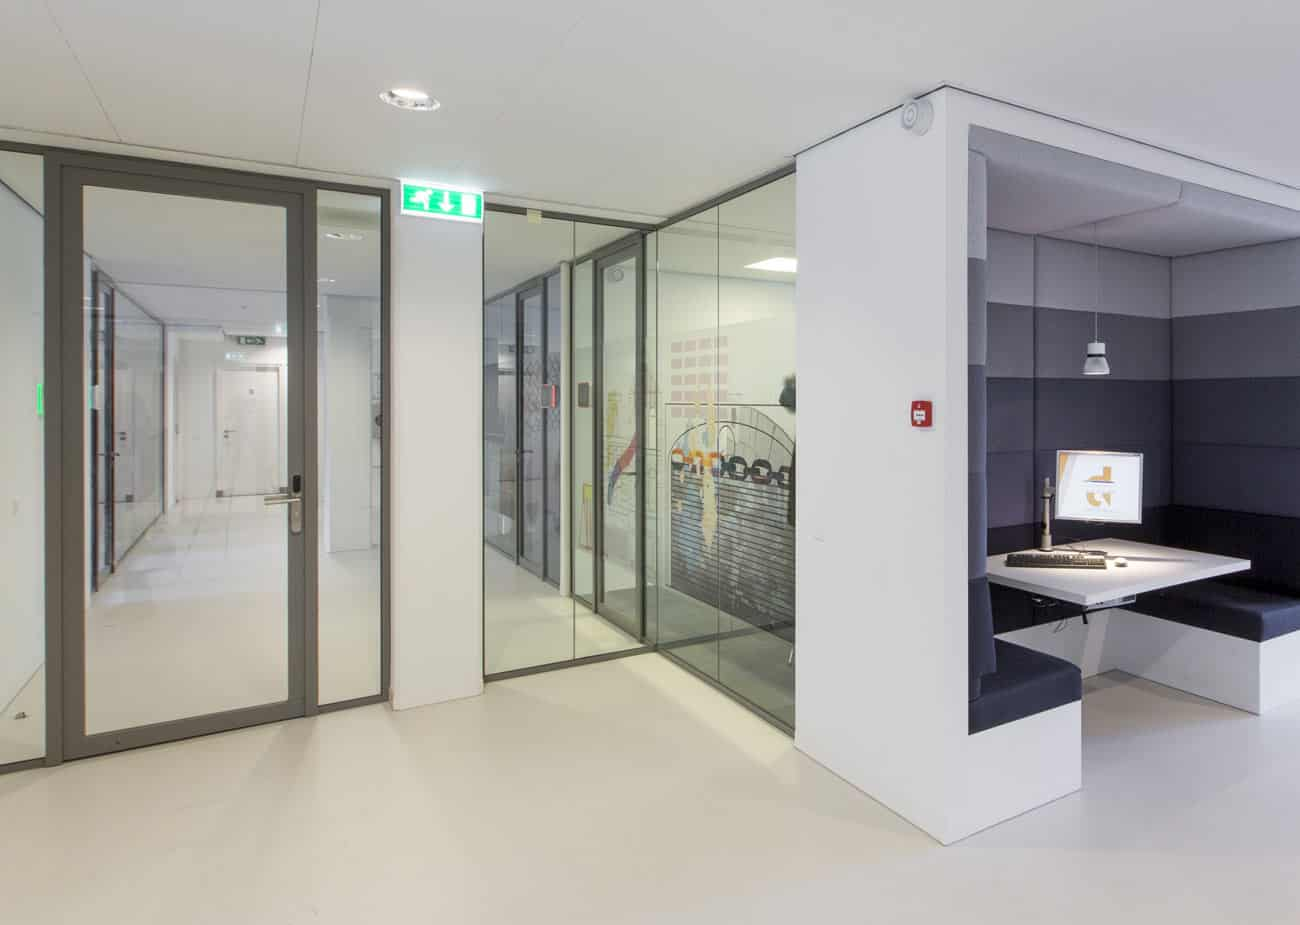 Polikliniek Het Dok, Rotterdam | Plan Effect